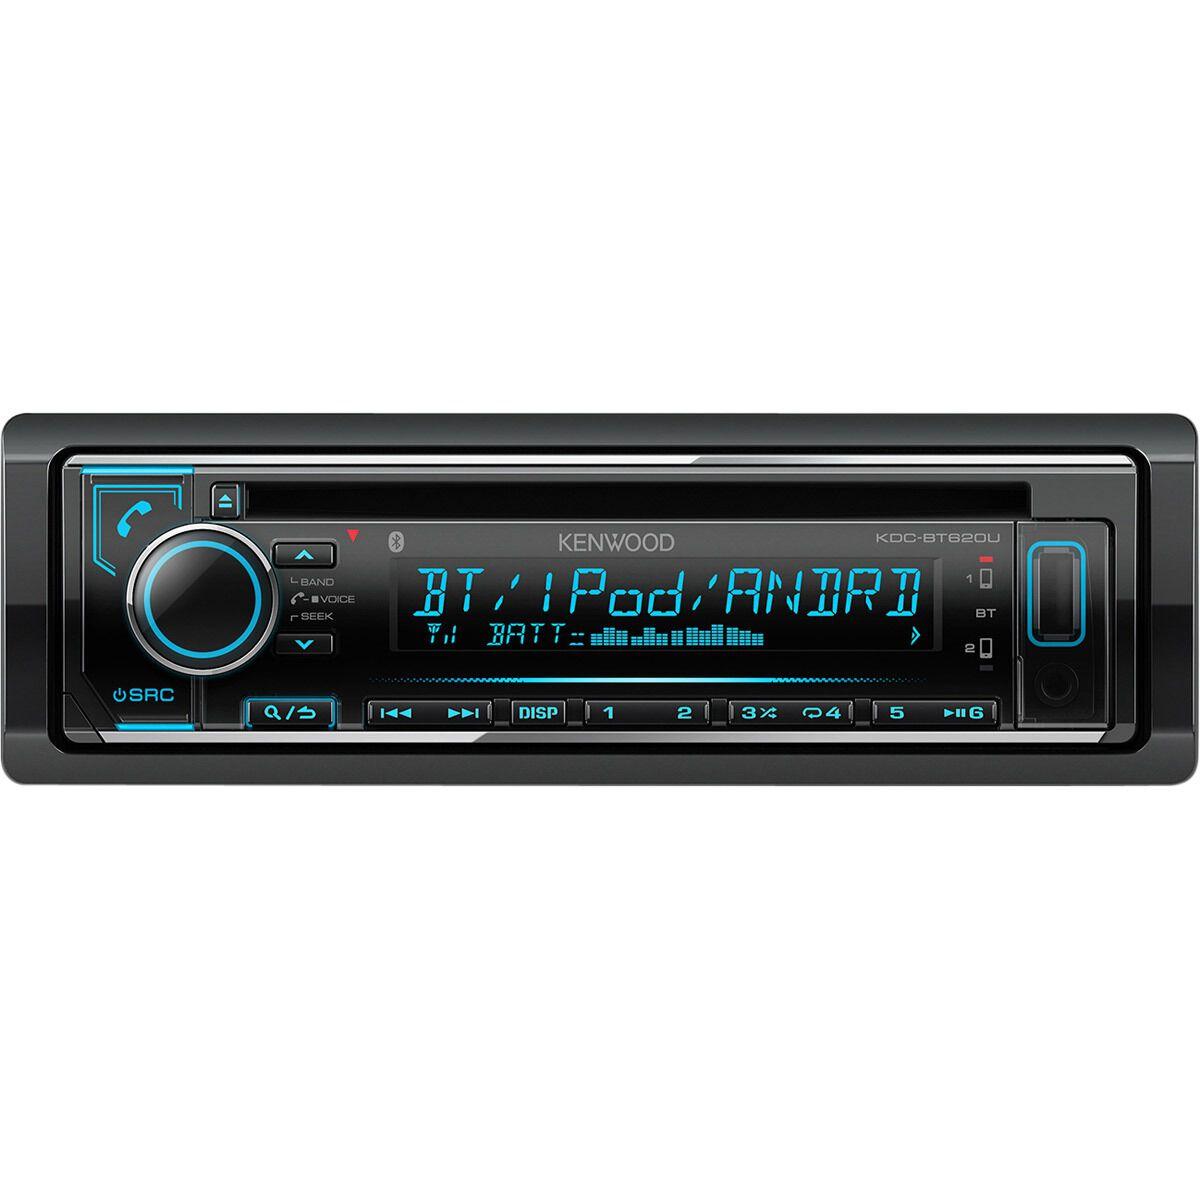 hight resolution of kenwood cd digital media player with bluetooth kdc bt620 scaau hi